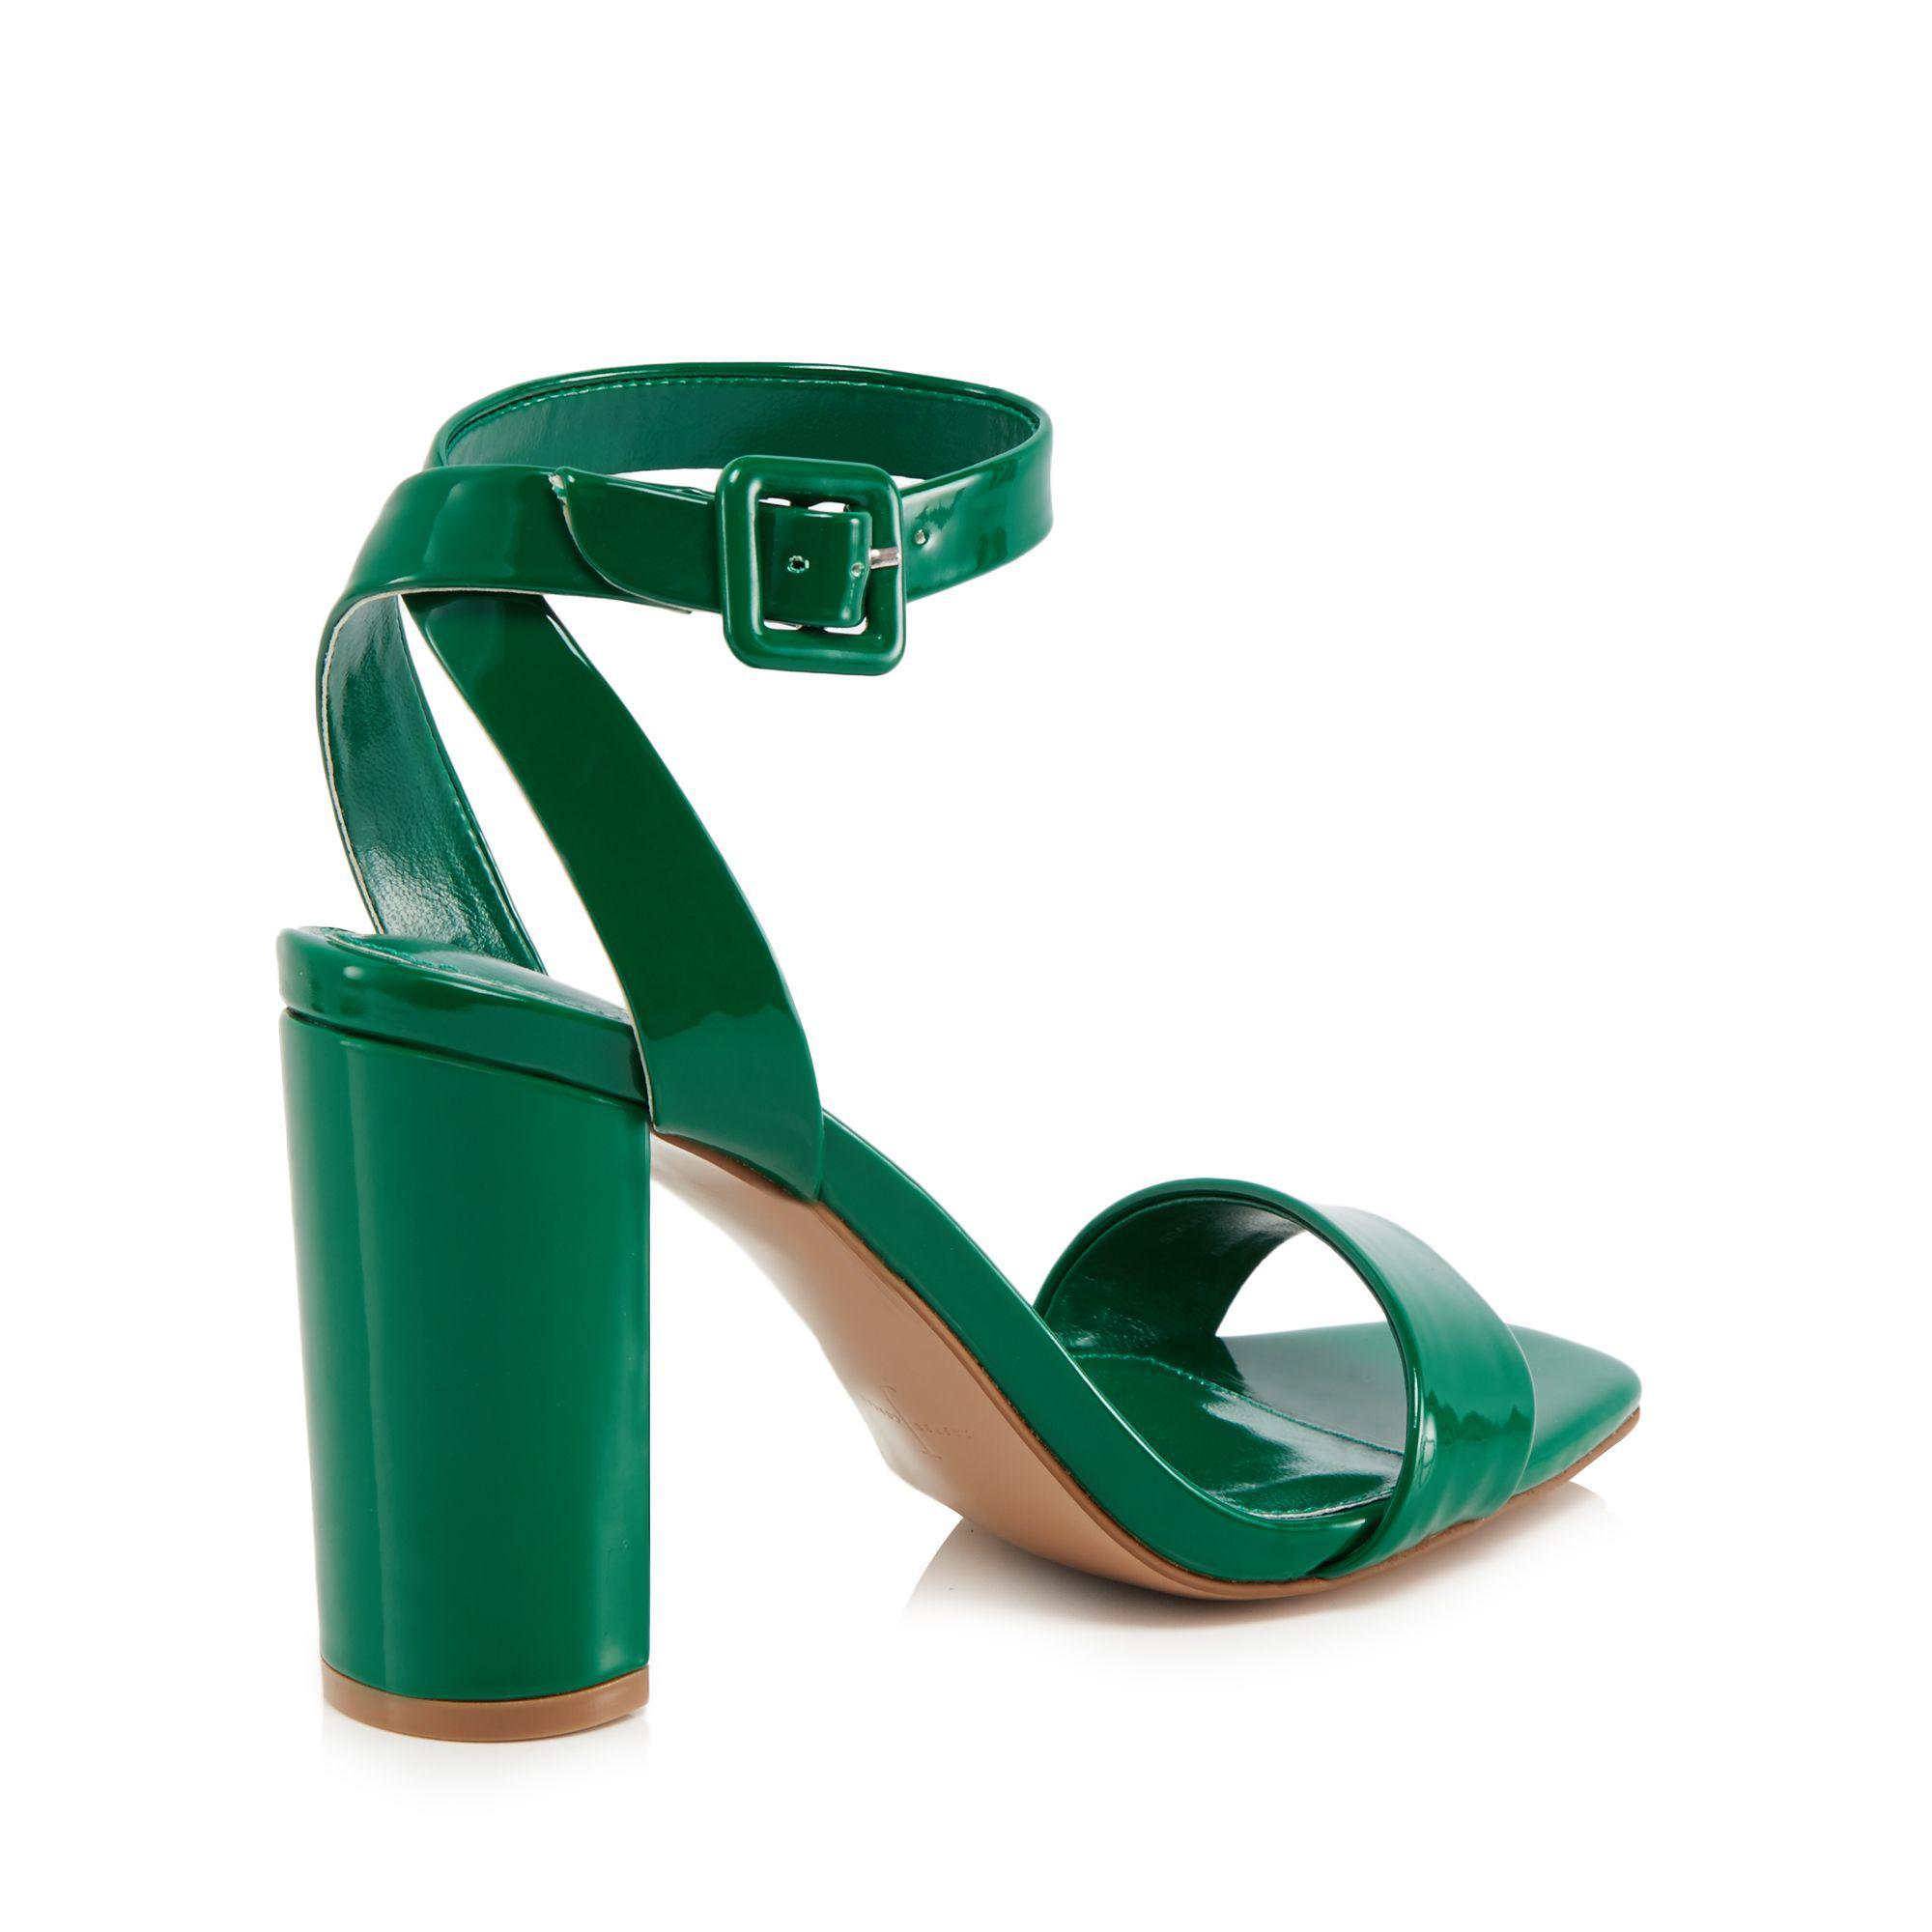 ece94f251165e8 J By Jasper Conran Green Patent  jessica  High Block Heel Ankle ...